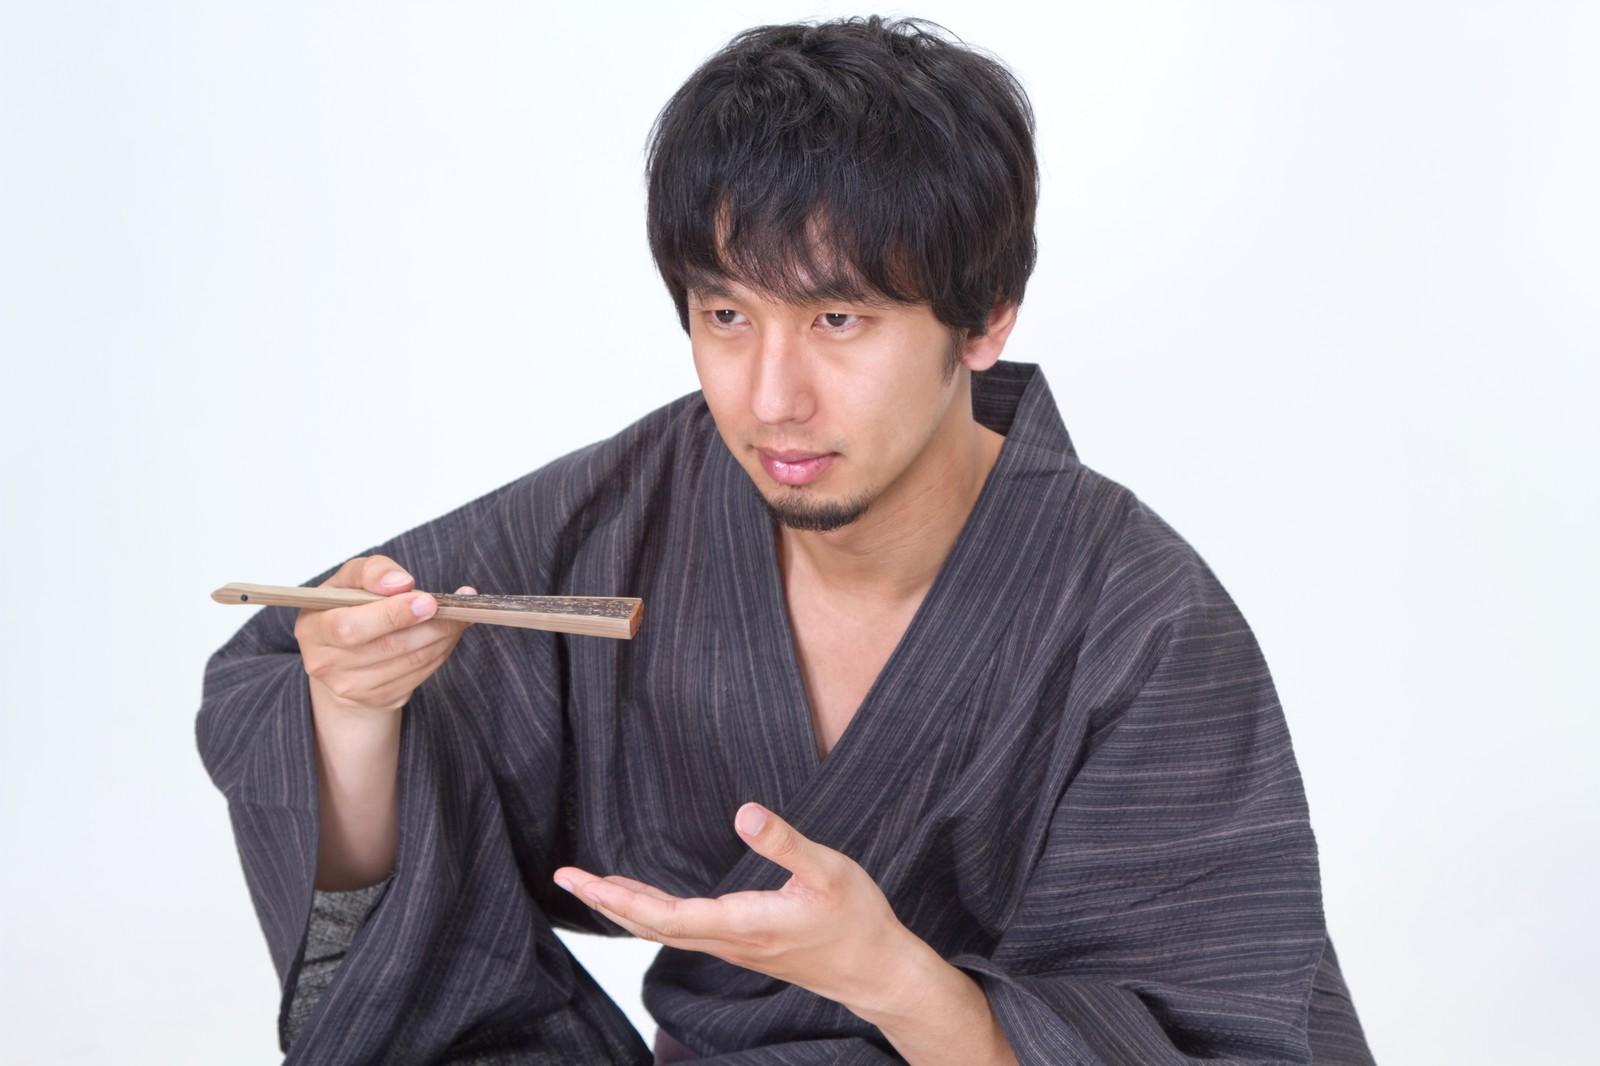 N853_tabemonowotaberakugonoshi-n_TP_V.jpg